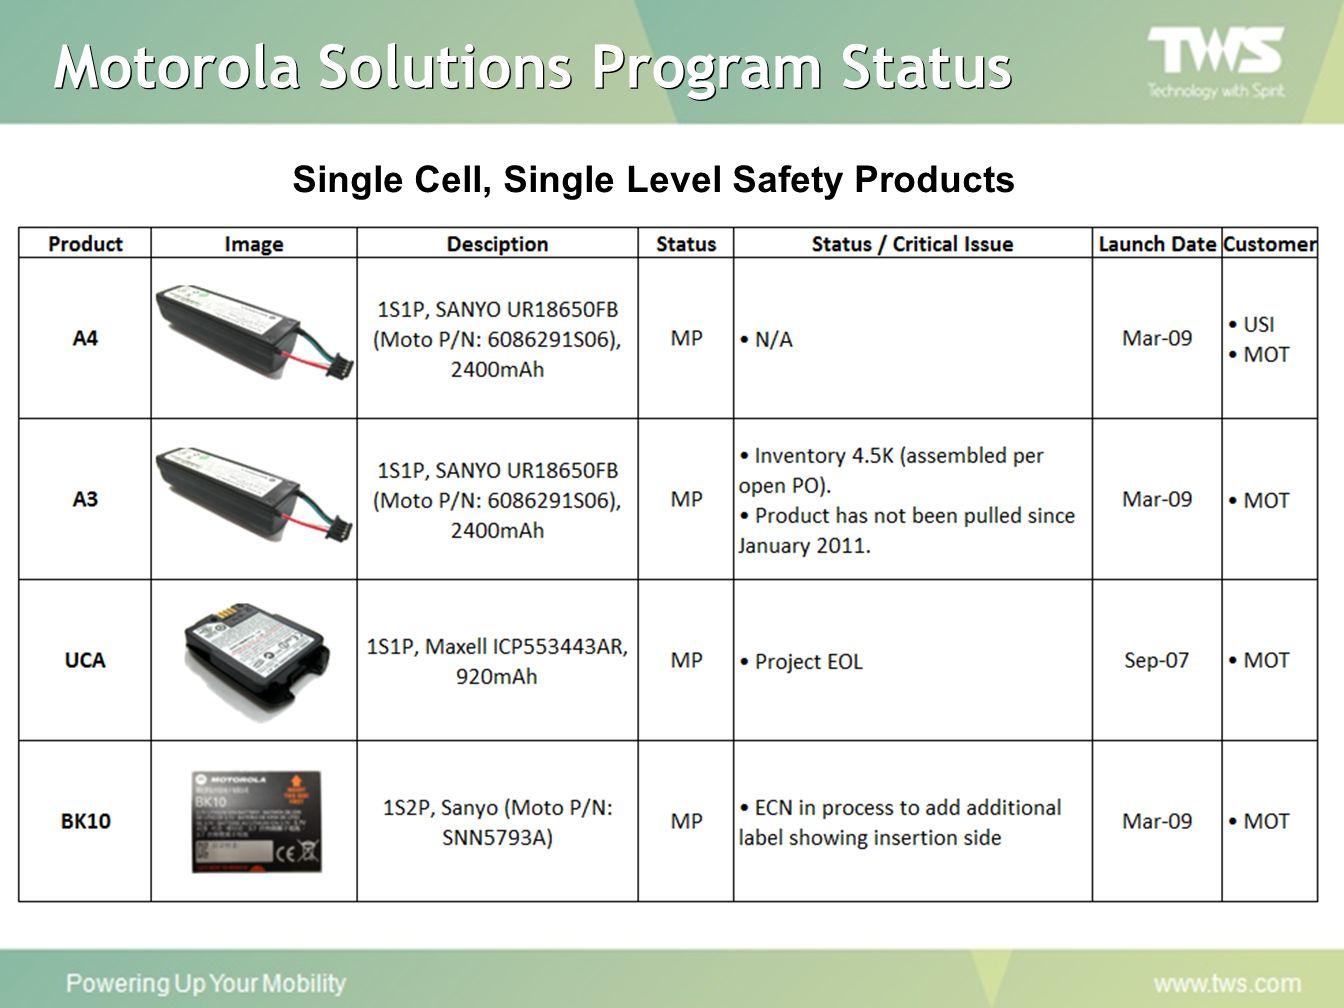 Motorola Solutions Program Status